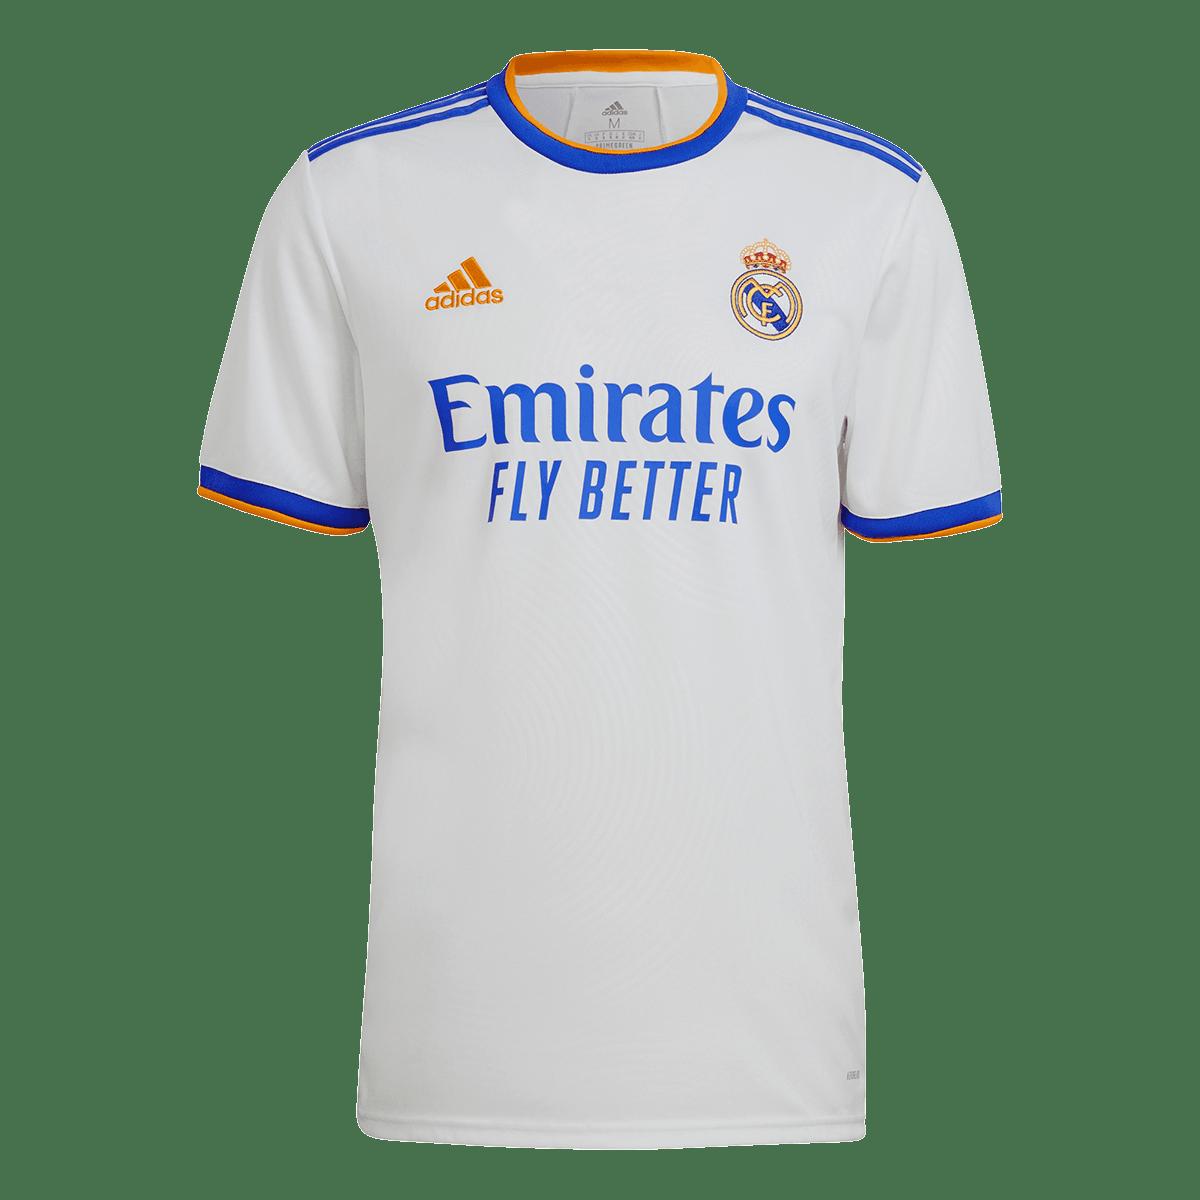 Adidas Real Madrid Herren Heim Trikot 2021 22 Weiss Fussball Shop In 2021 Real Madrid Real Madrid Shirt Real Madrid Soccer